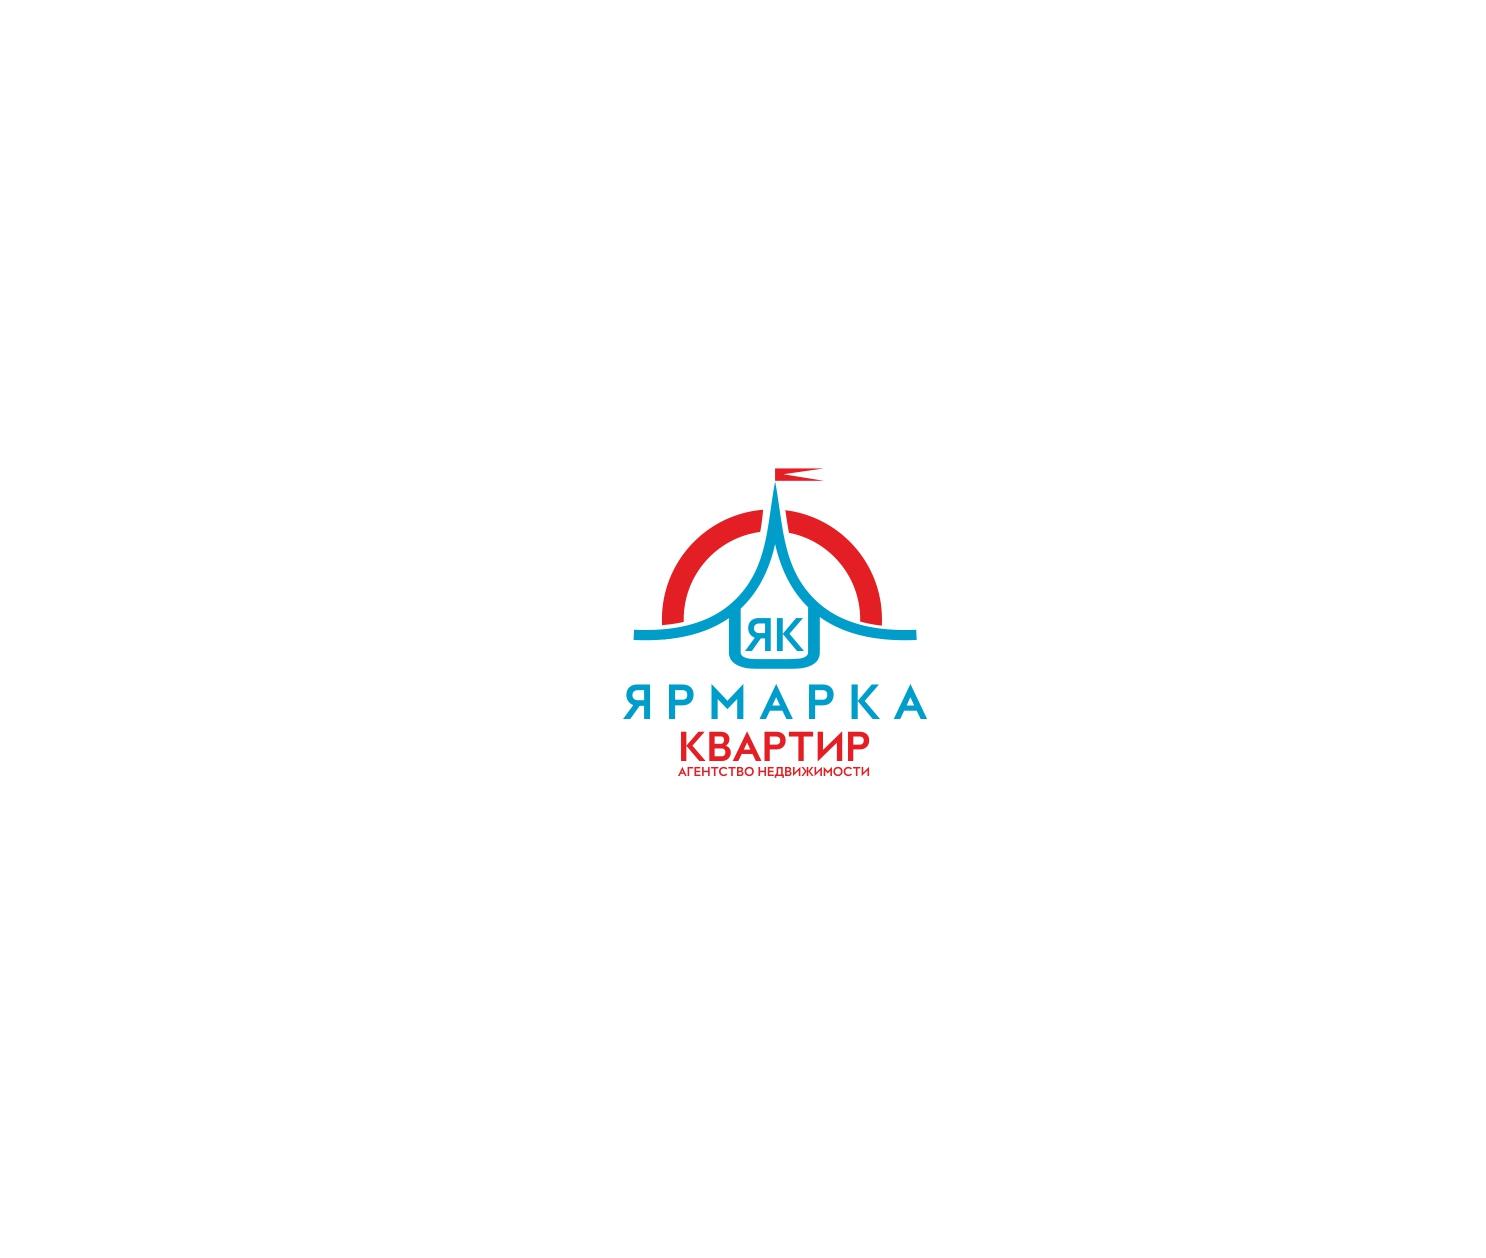 Создание логотипа, с вариантами для визитки и листовки фото f_0426007e88a69866.jpg